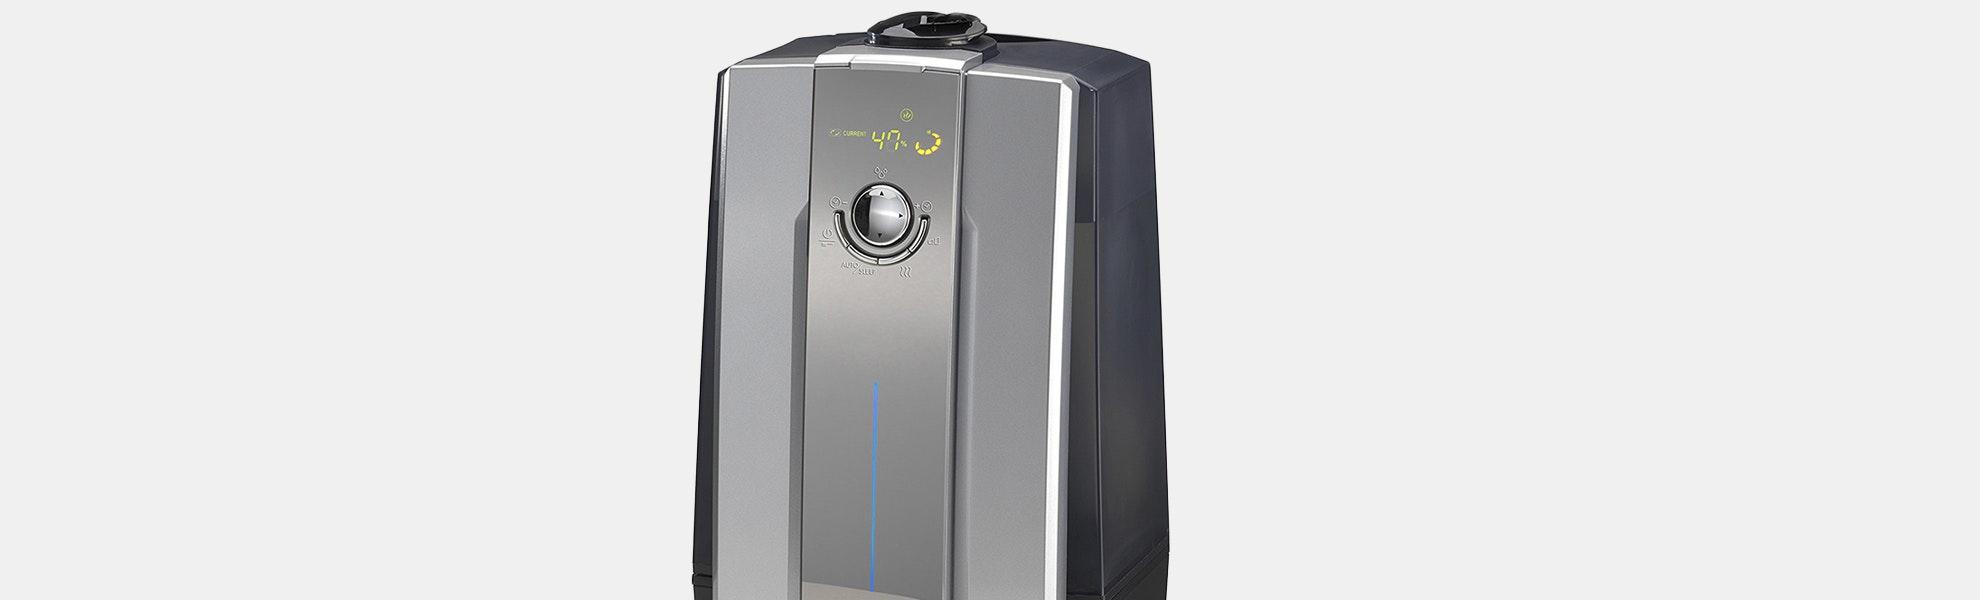 Boneco Warm/Cool Mist Ultrasonic Humidifier 7142